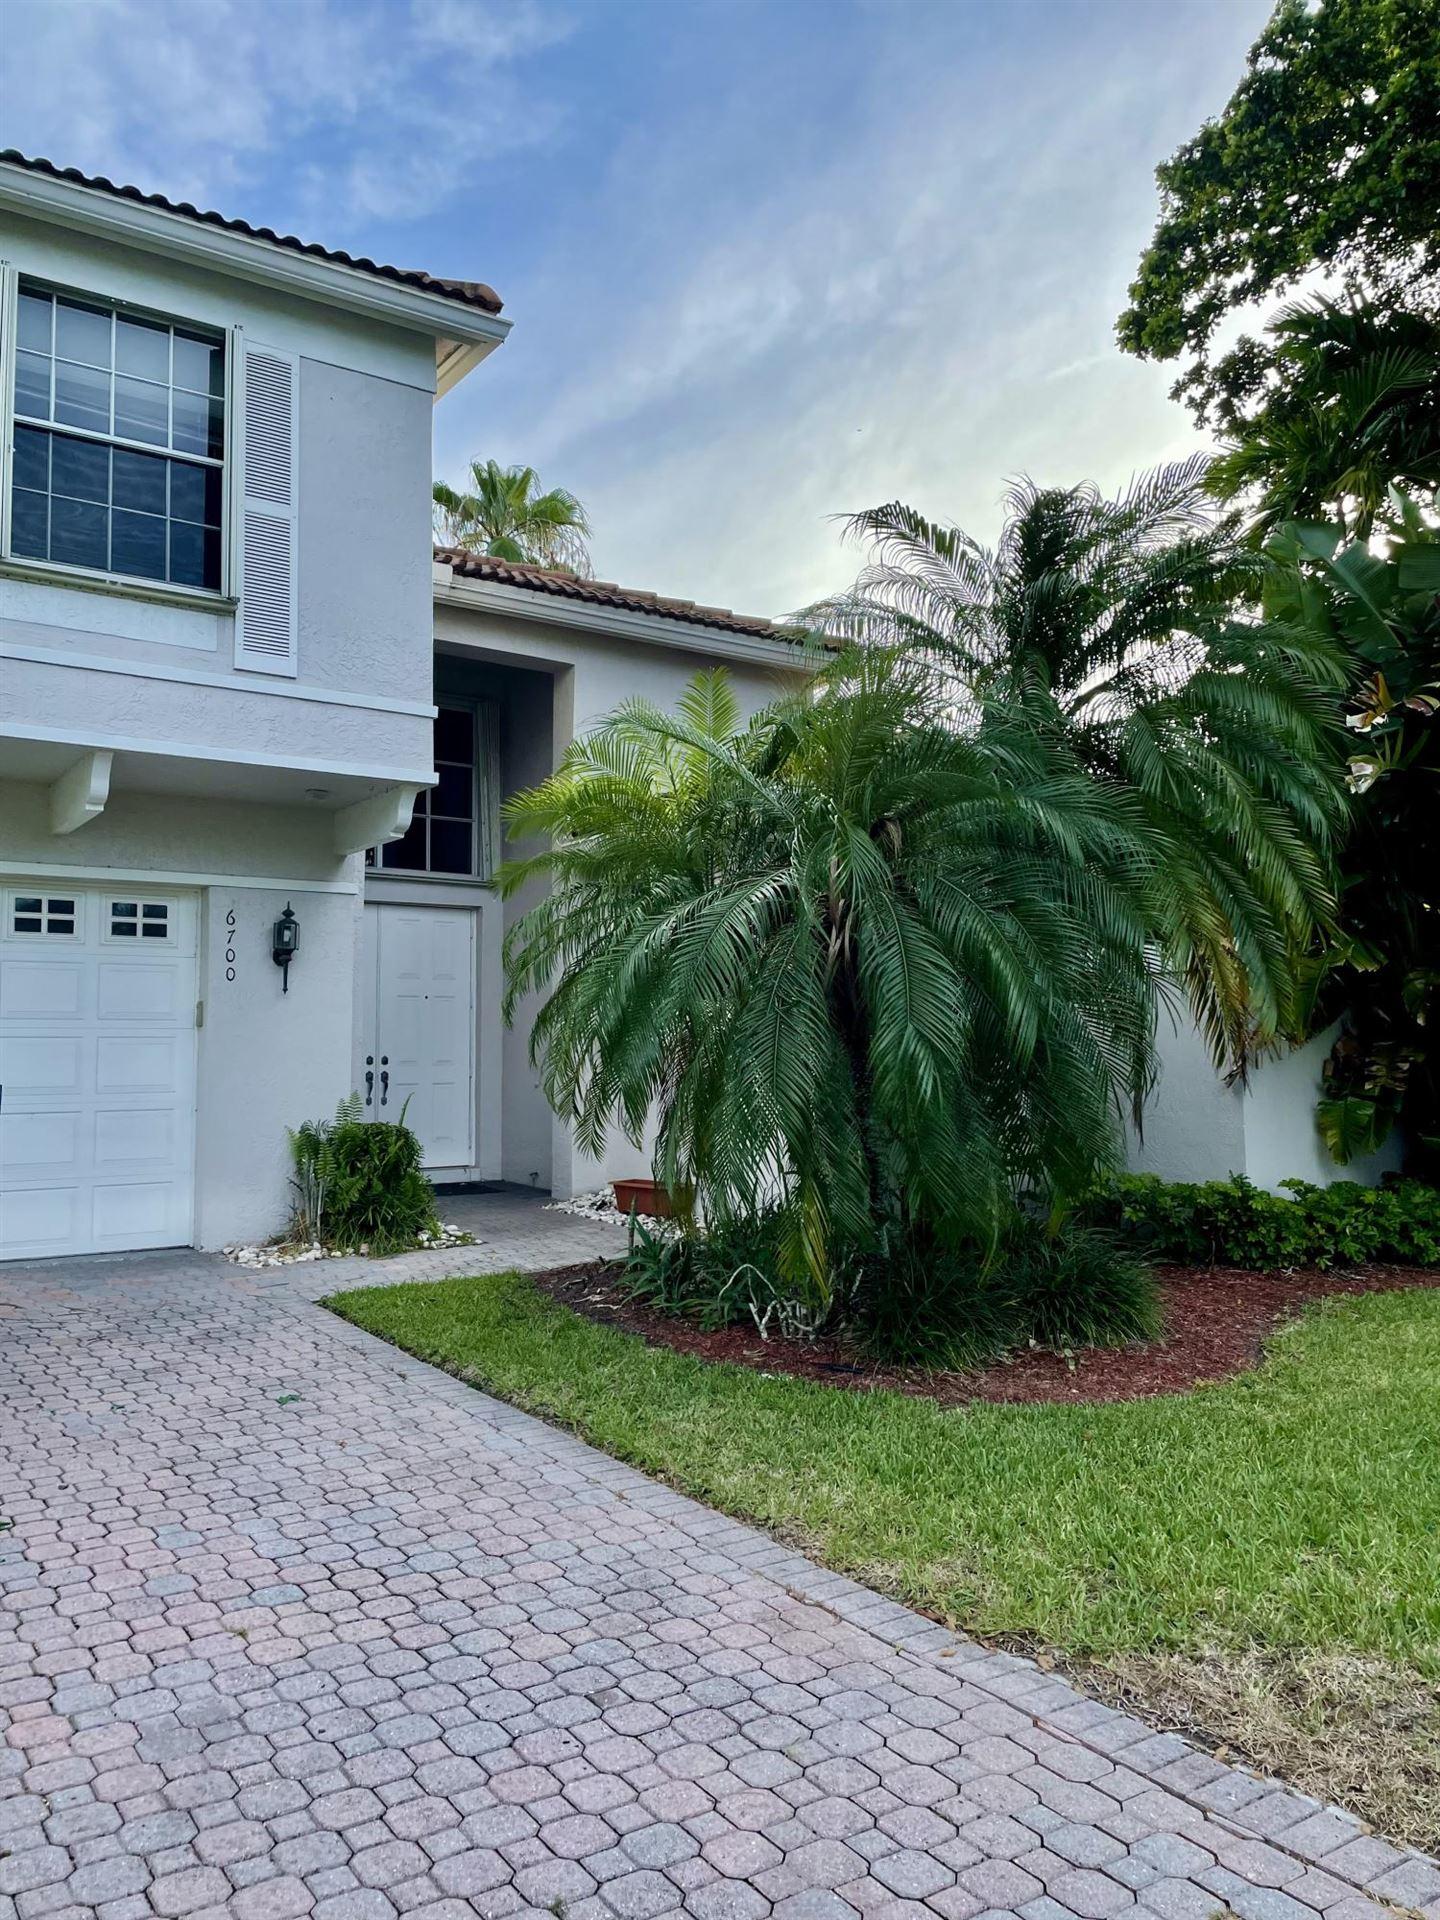 6700 Portside Drive, Boca Raton, FL 33496 - #: RX-10731420